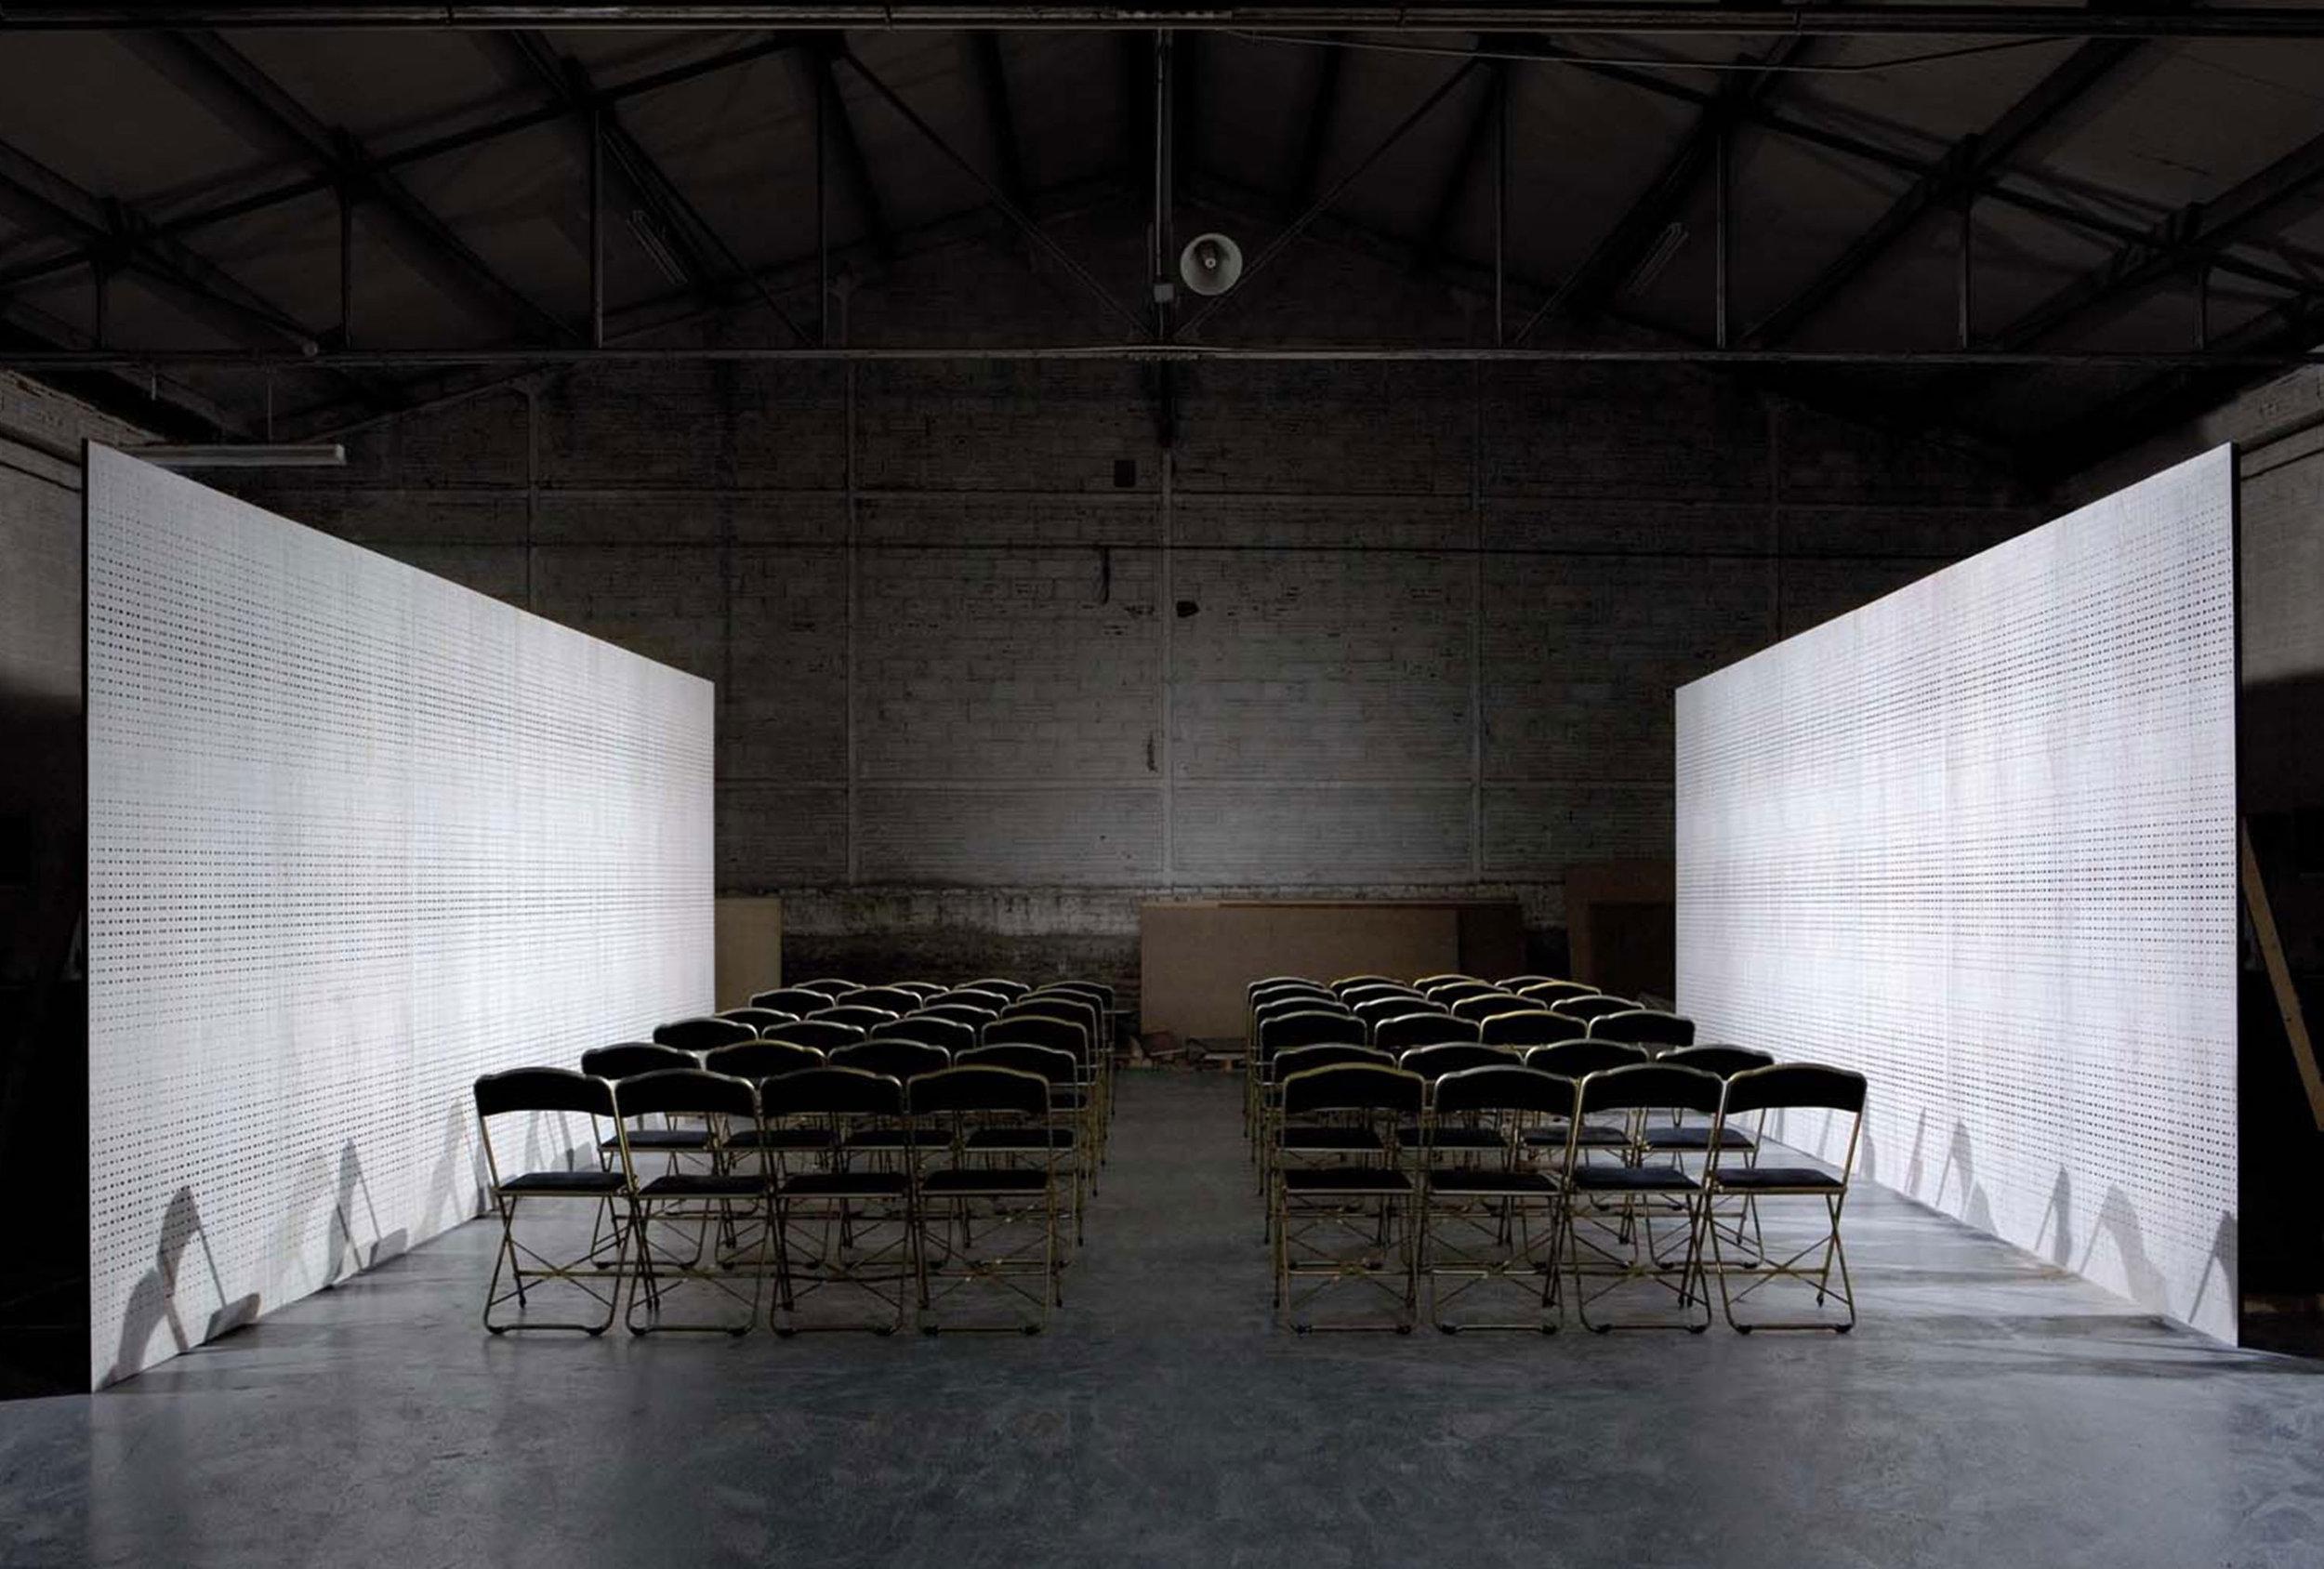 2008-oberflex-obersound-espace-photo-chaises.jpg